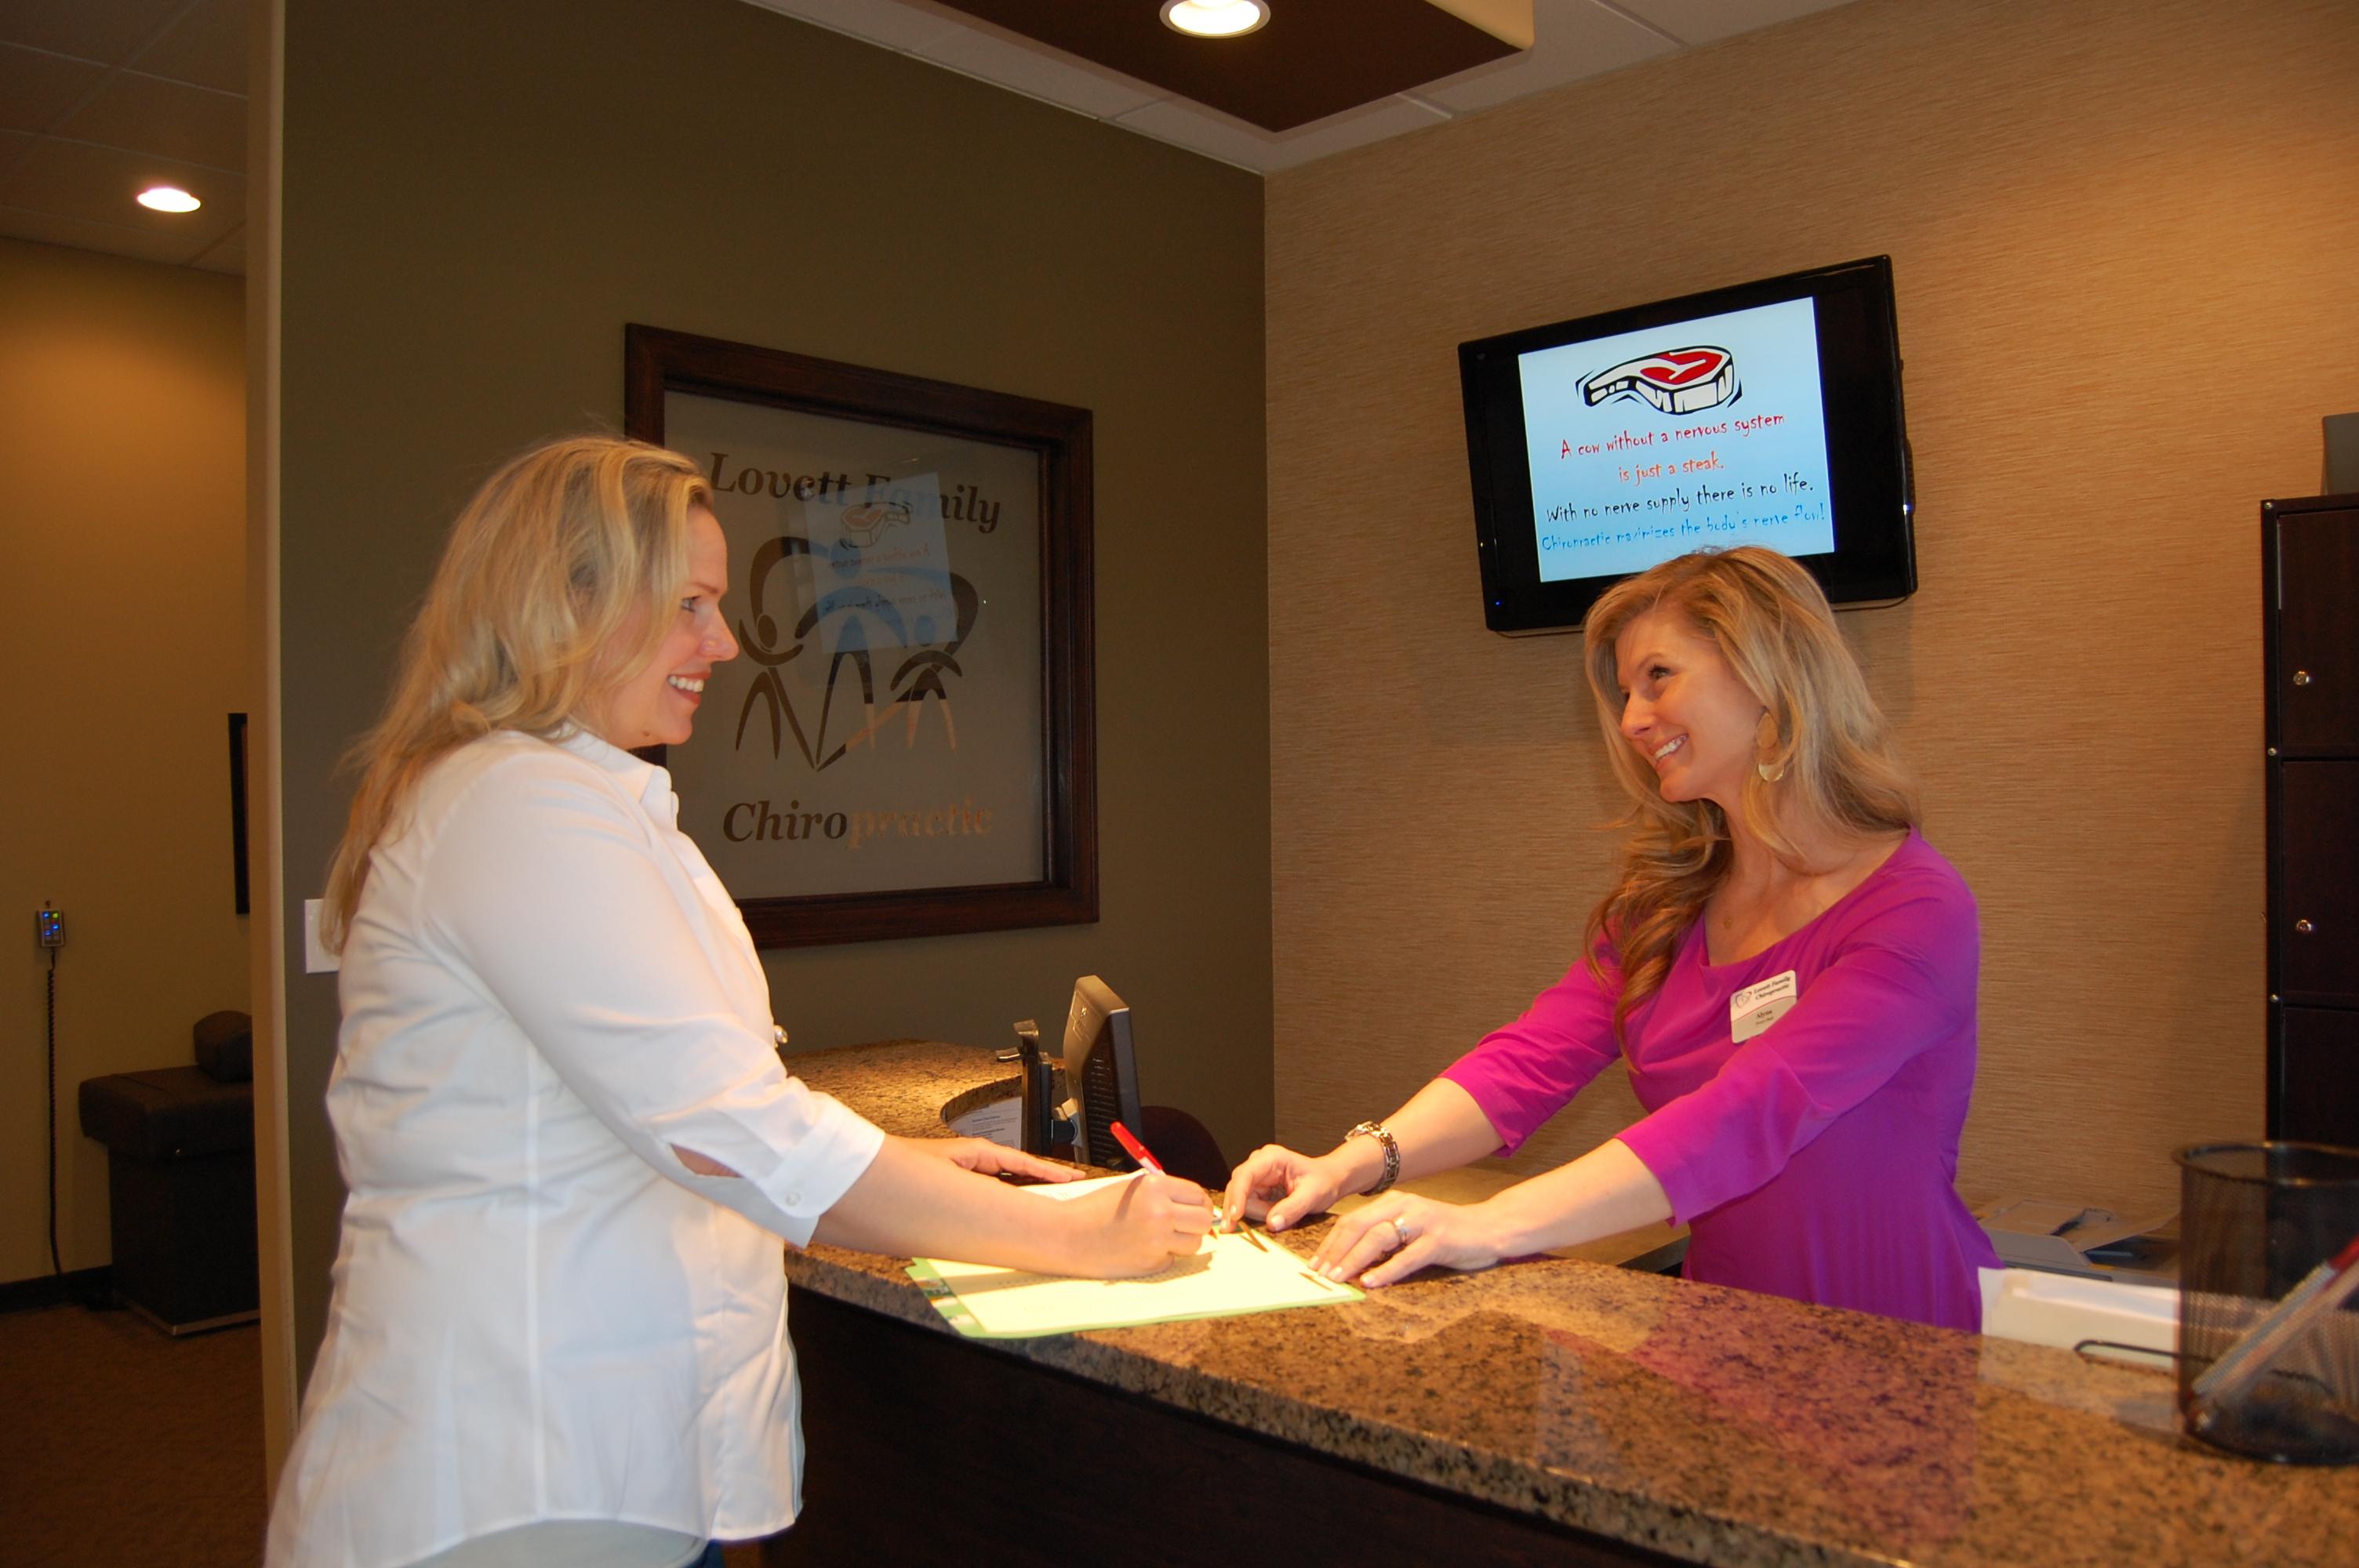 Lovett Family Chiropractic and Wellness Center image 3